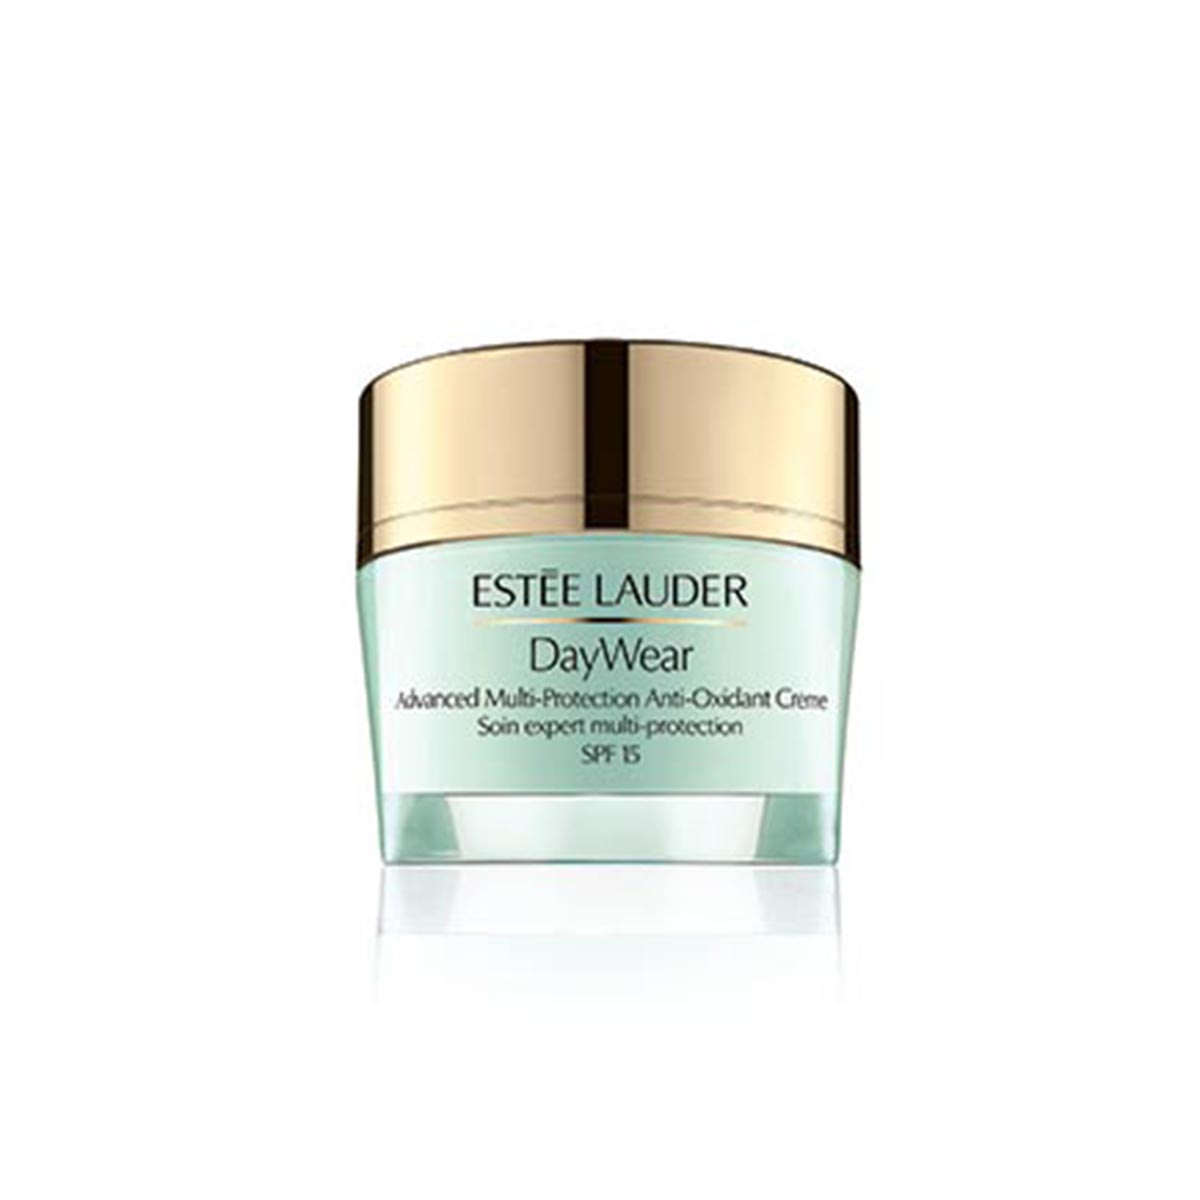 Estee lauder daywear cream piel mixta 50ml spf15